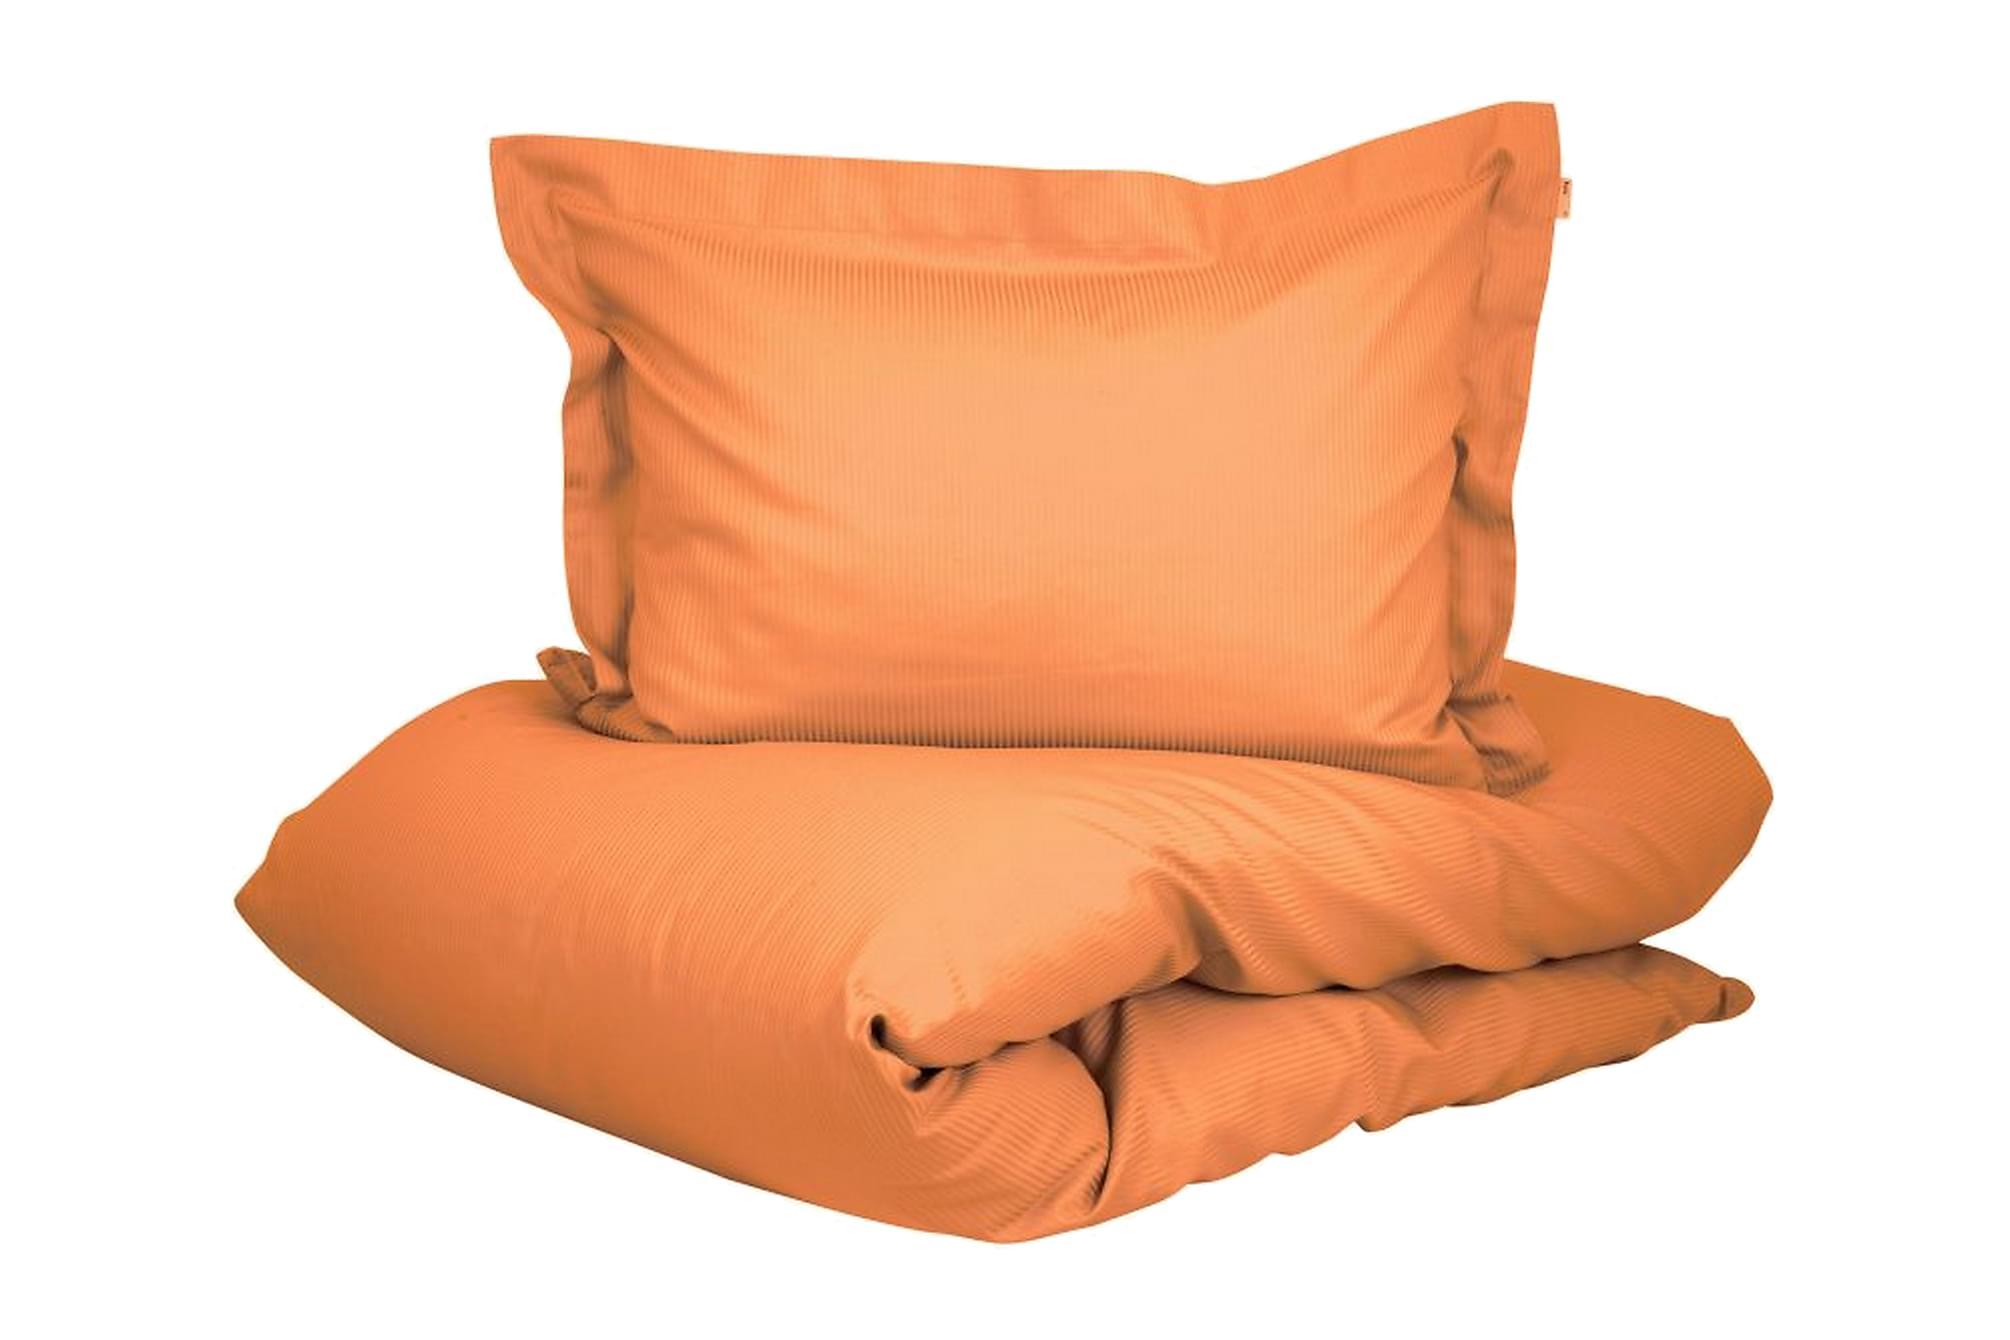 ALDERNEY Bäddset 220x230 cm Satin Orange, Sängkläder